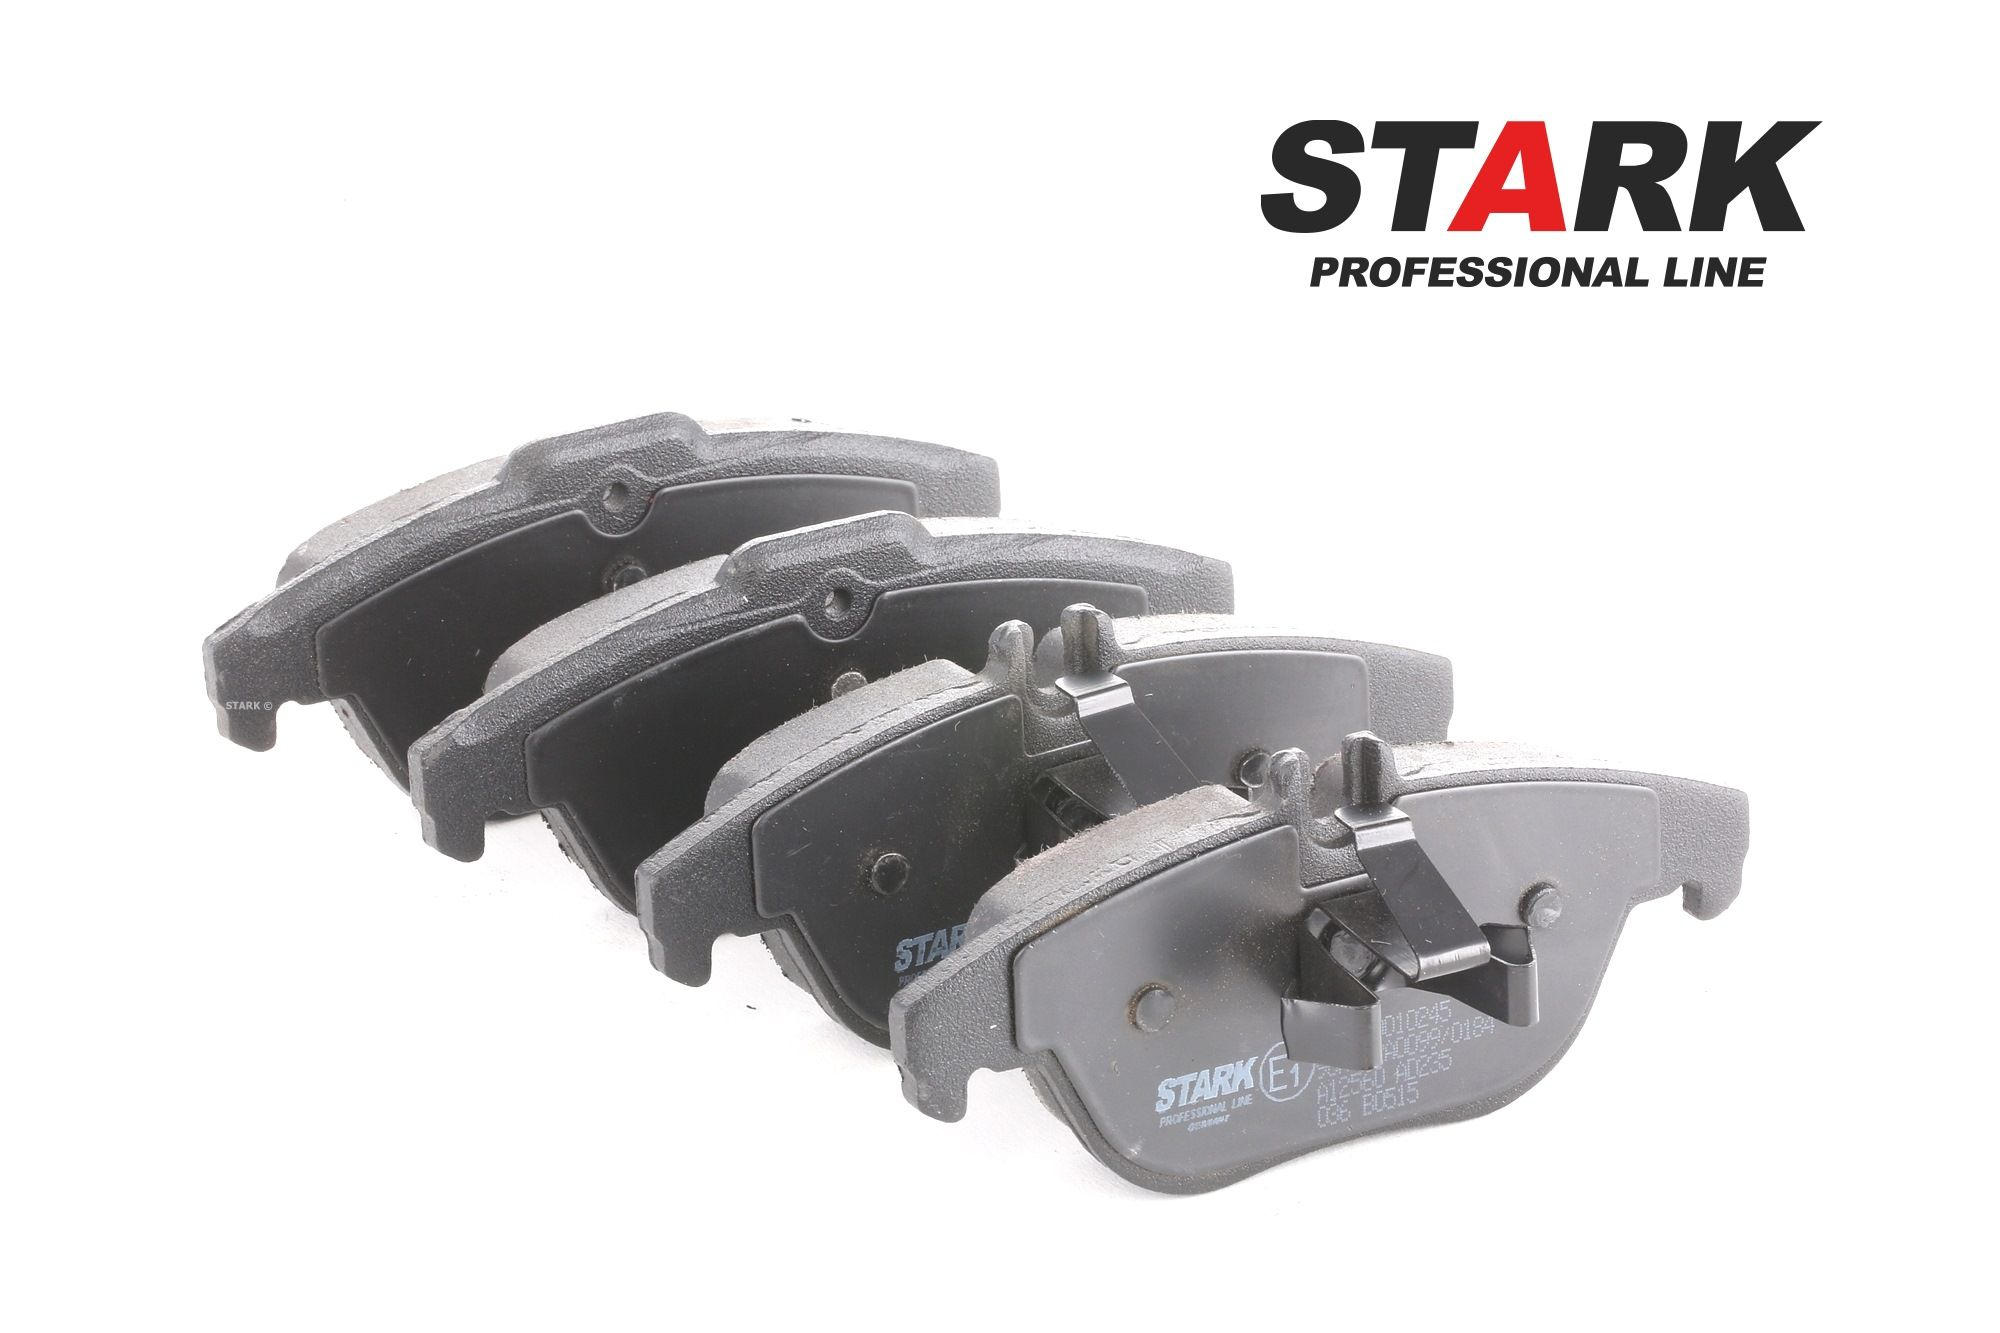 MERCEDES-BENZ GLK 2008 Bremsbelagsatz - Original STARK SKBP-0010245 Höhe: 52,4, 54,6mm, Breite: 122,5mm, Dicke/Stärke 1: 17,6mm